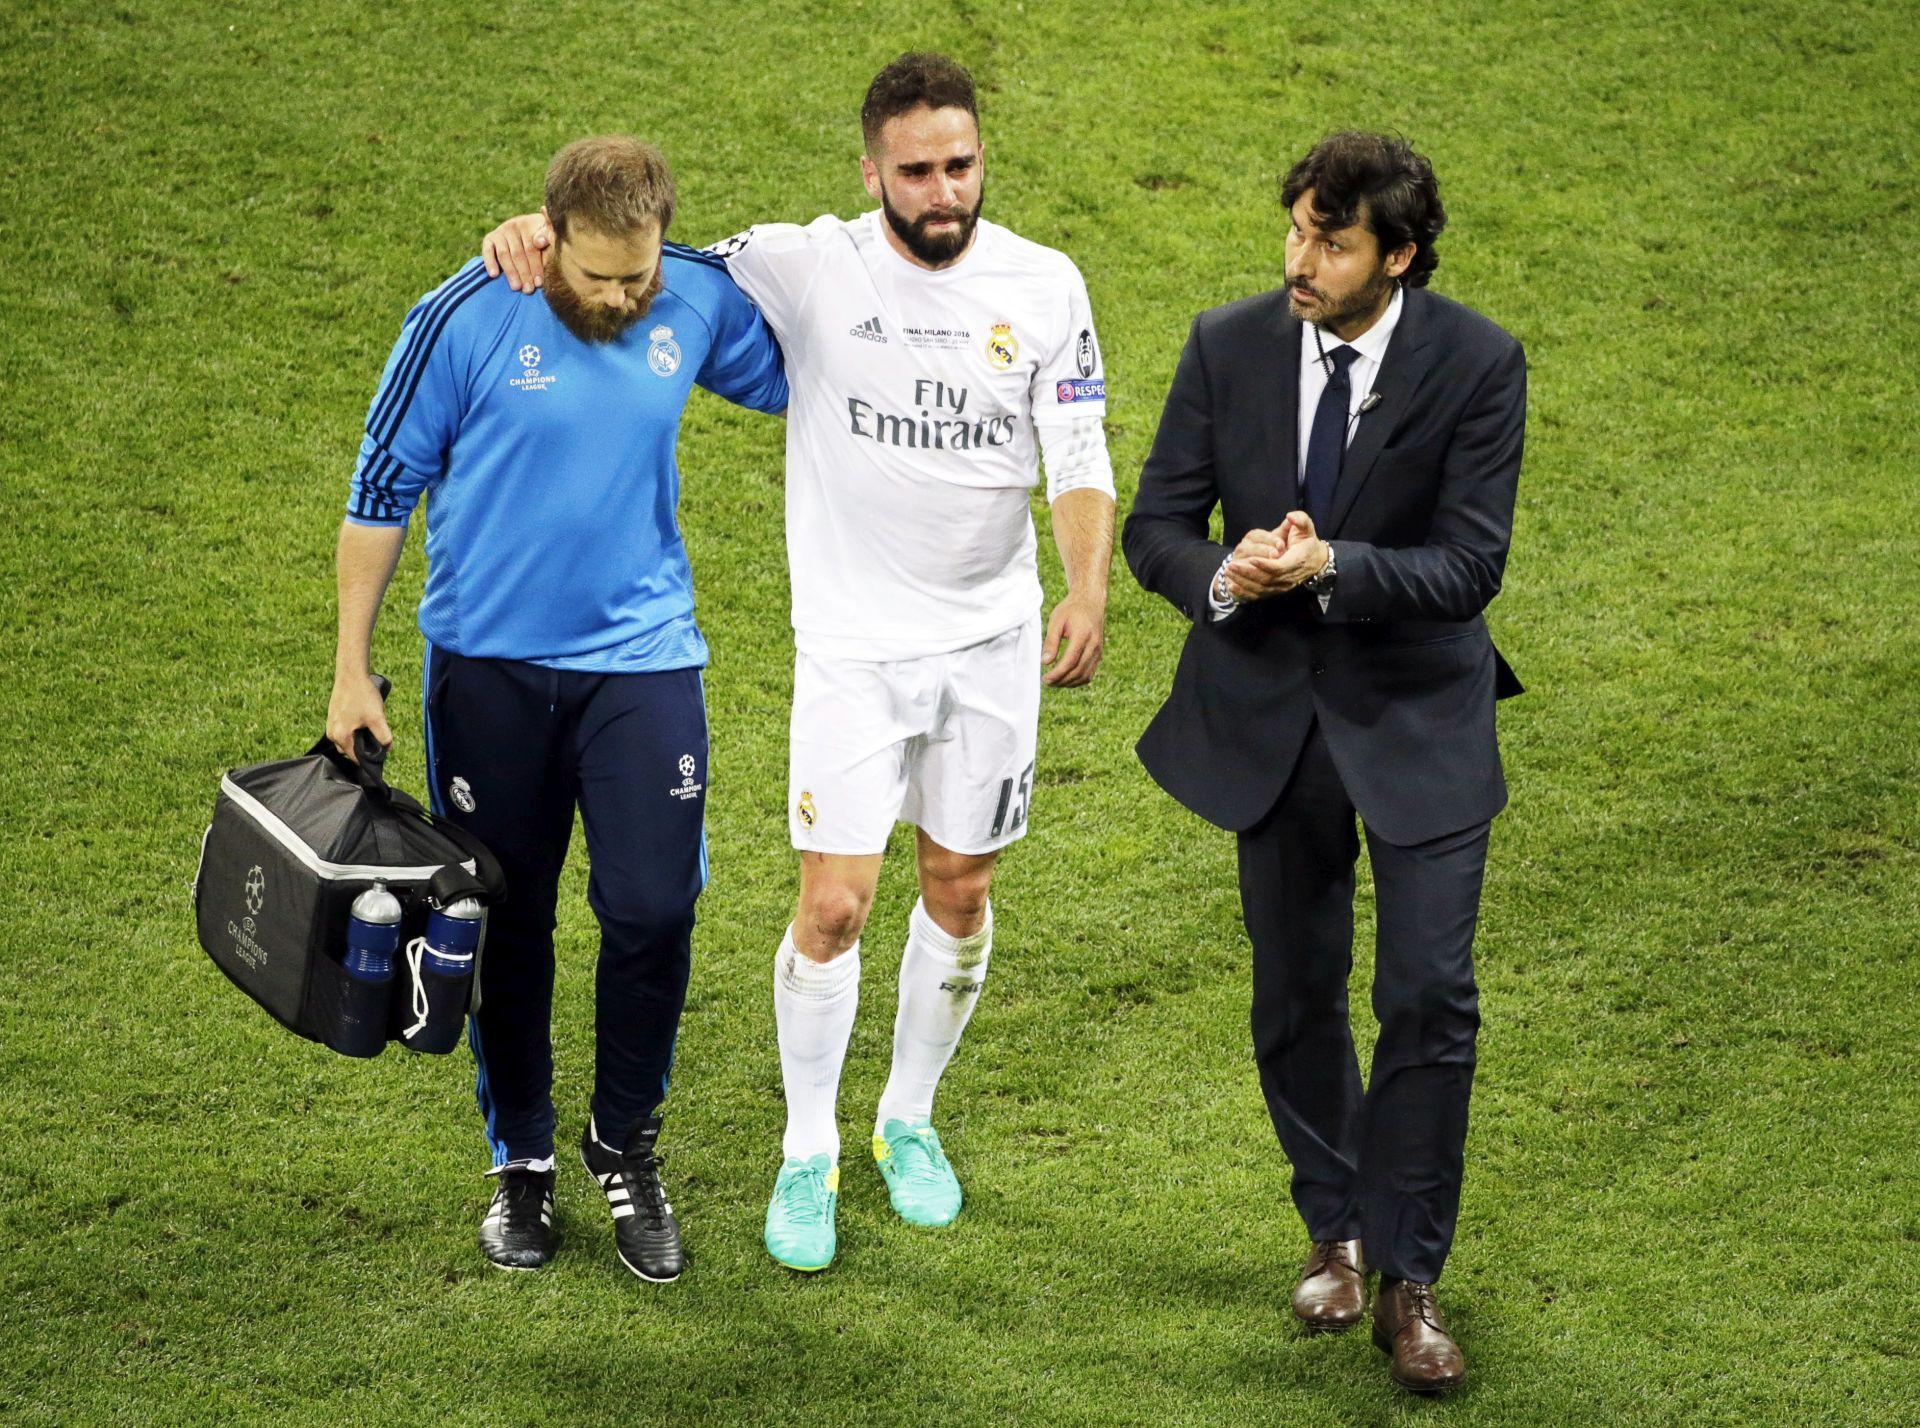 EURO 2016: Dani Carvajal ozlijeđen, upitan za Euro